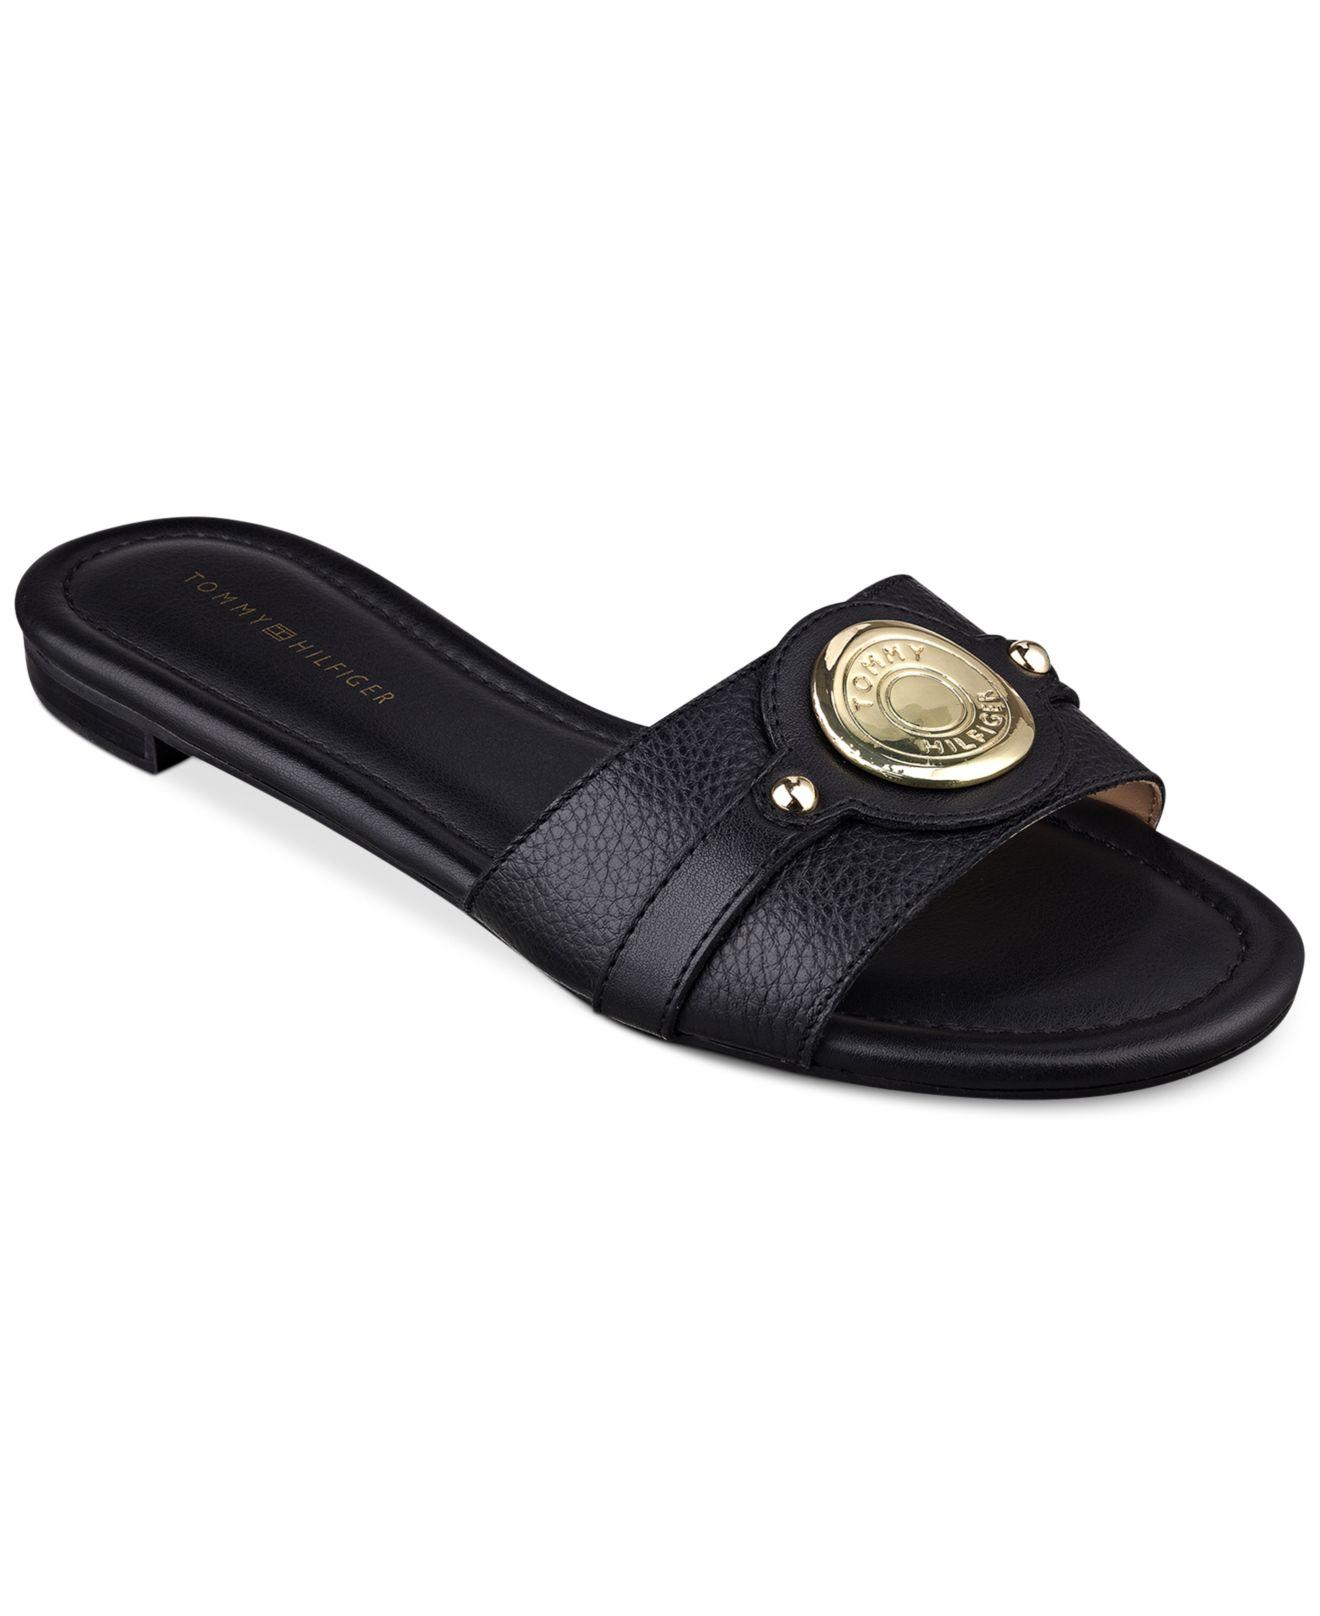 Tommy Hilfiger Women S Icela Slide Sandals In Black Lyst